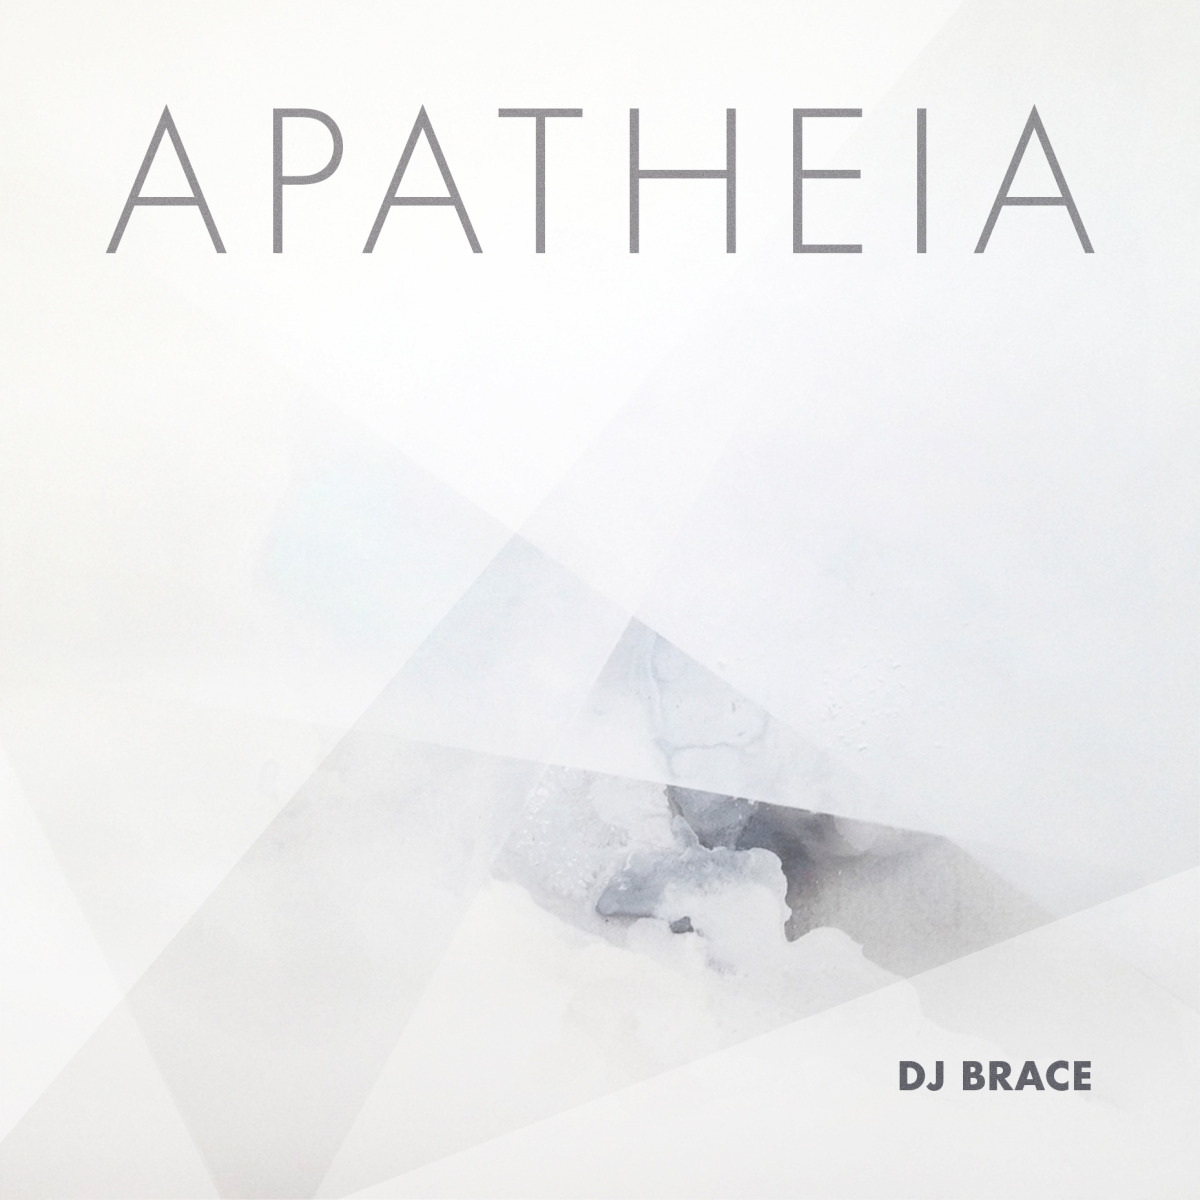 DJ Brace - Apatheia Cover